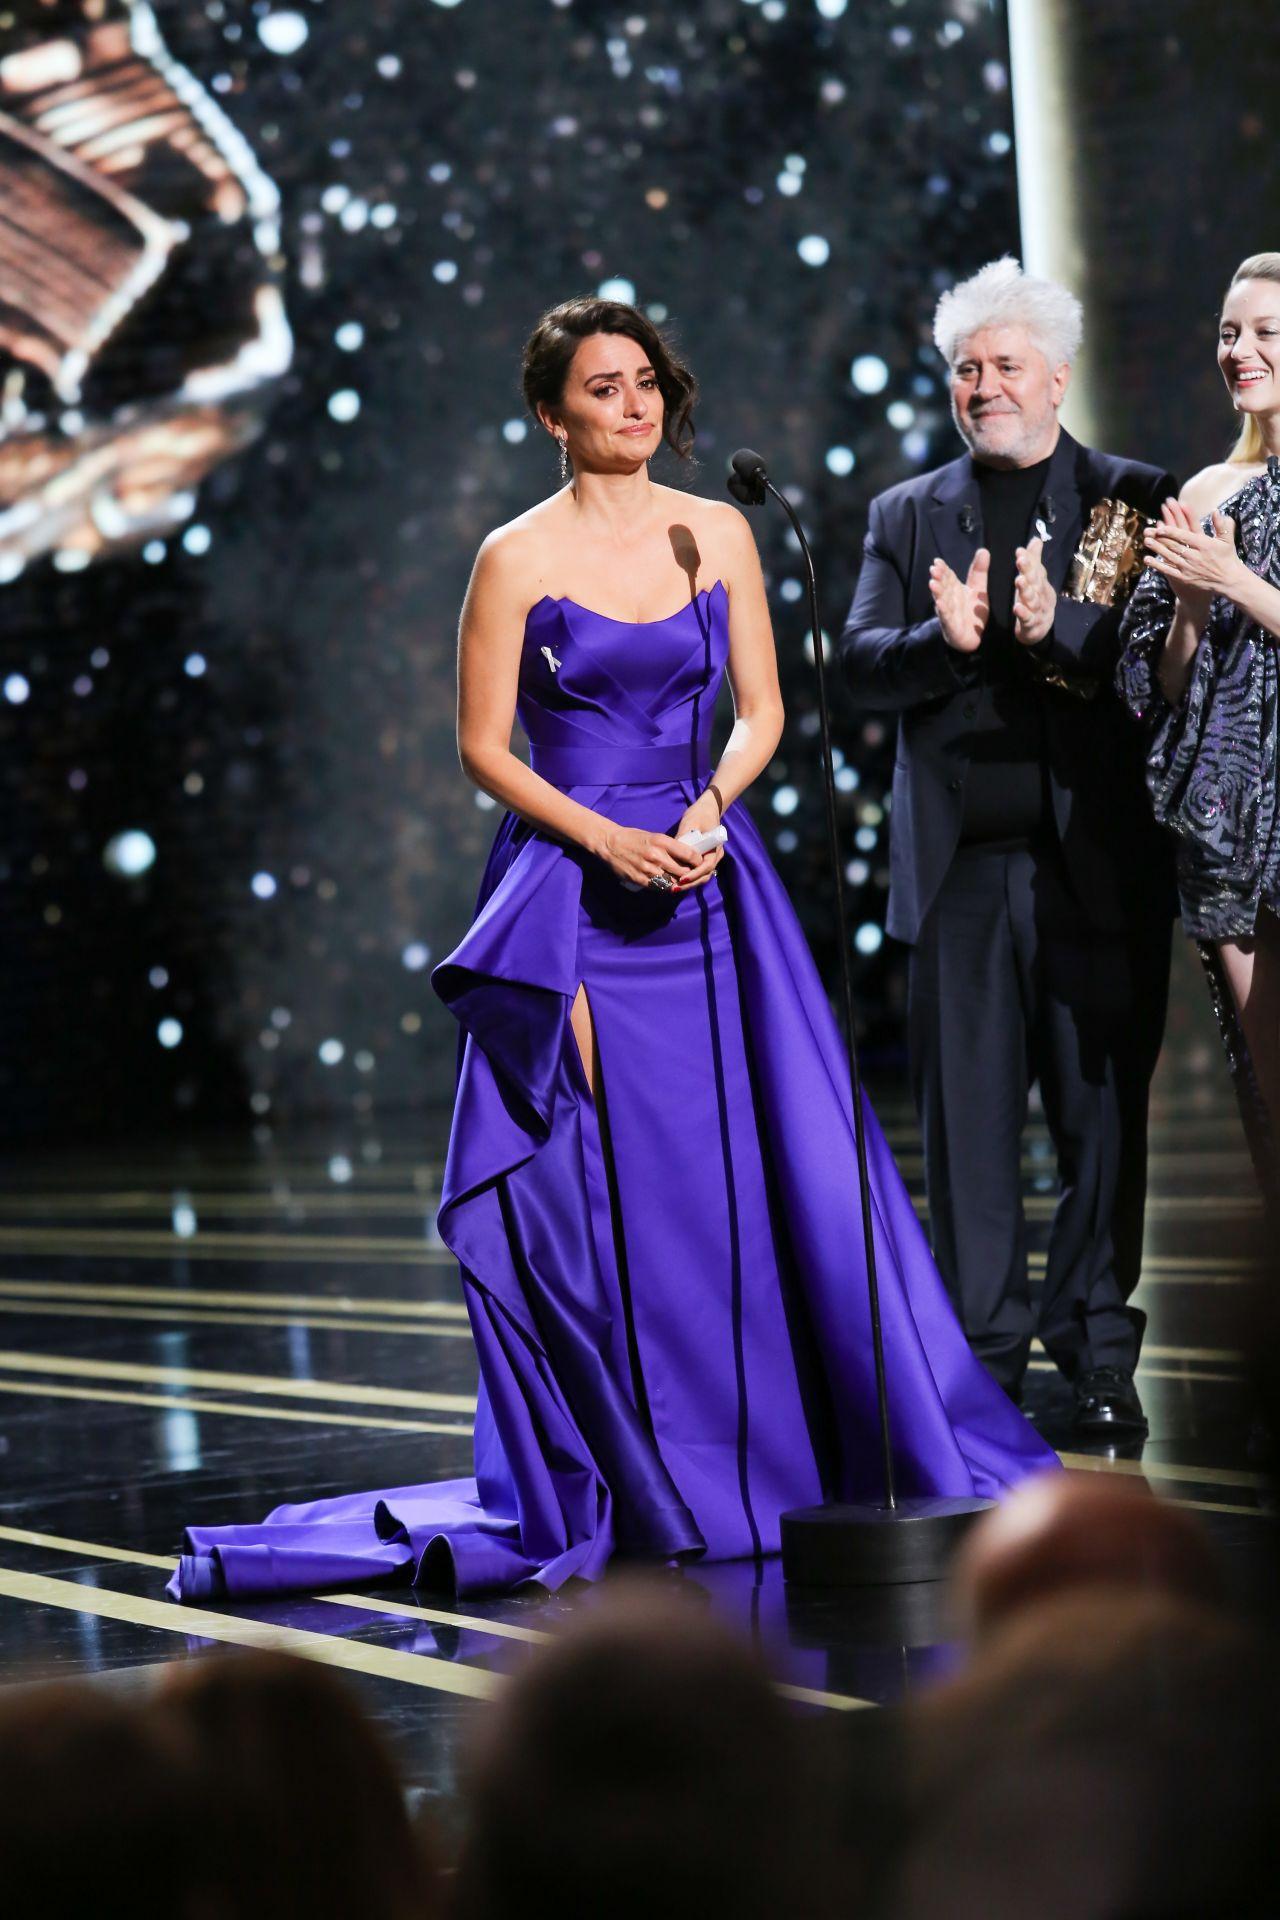 http://celebmafia.com/wp-content/uploads/2018/03/penelope-cruz-cesar-film-awards-2018-in-paris-0.jpg